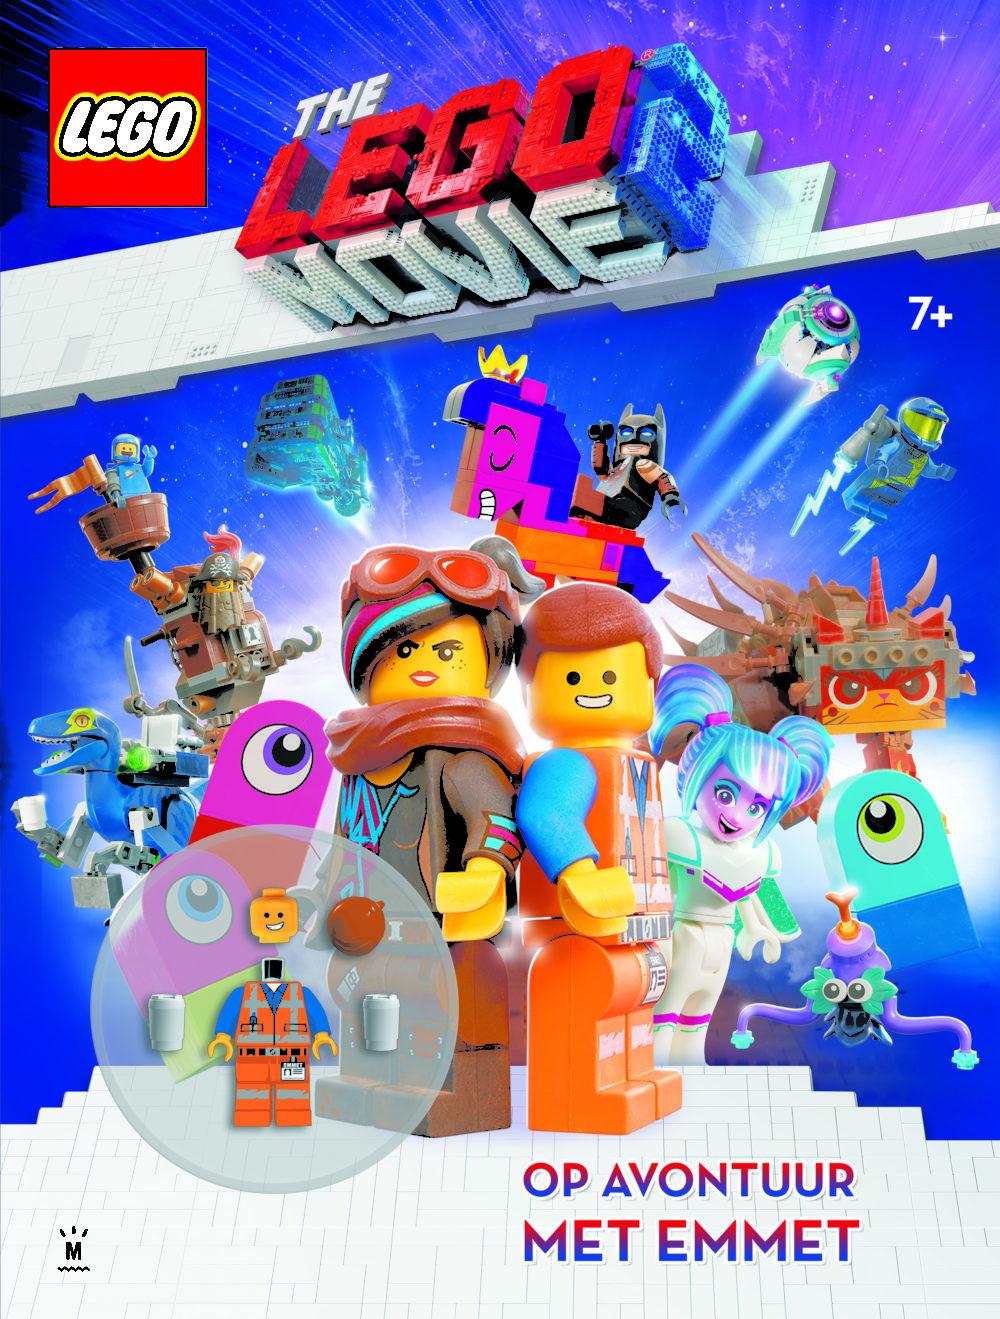 LEGO Special The LEGO Movie 2